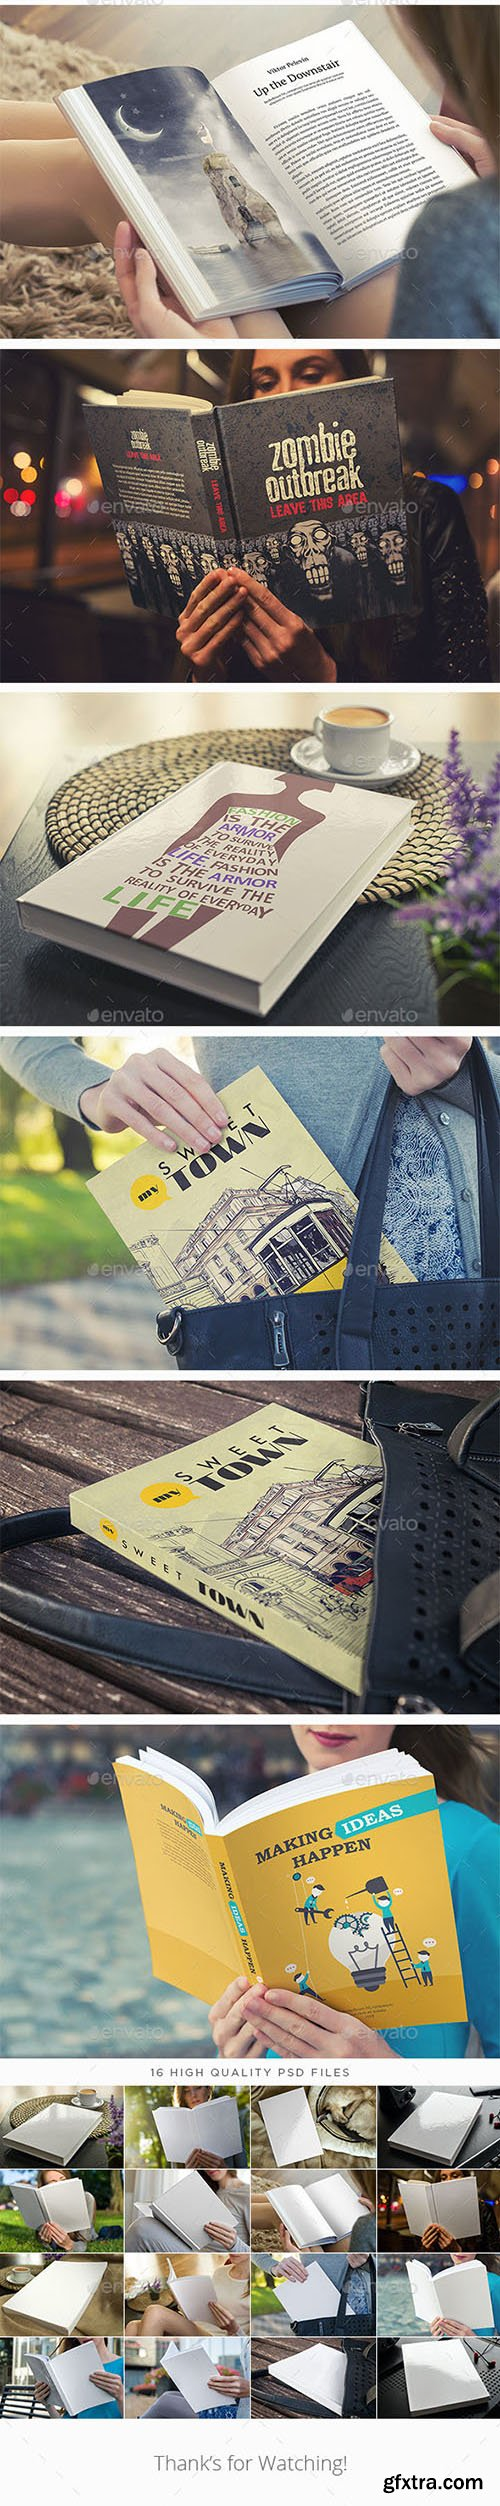 GraphicRiver: Book Mock-Up Bundle 1093853